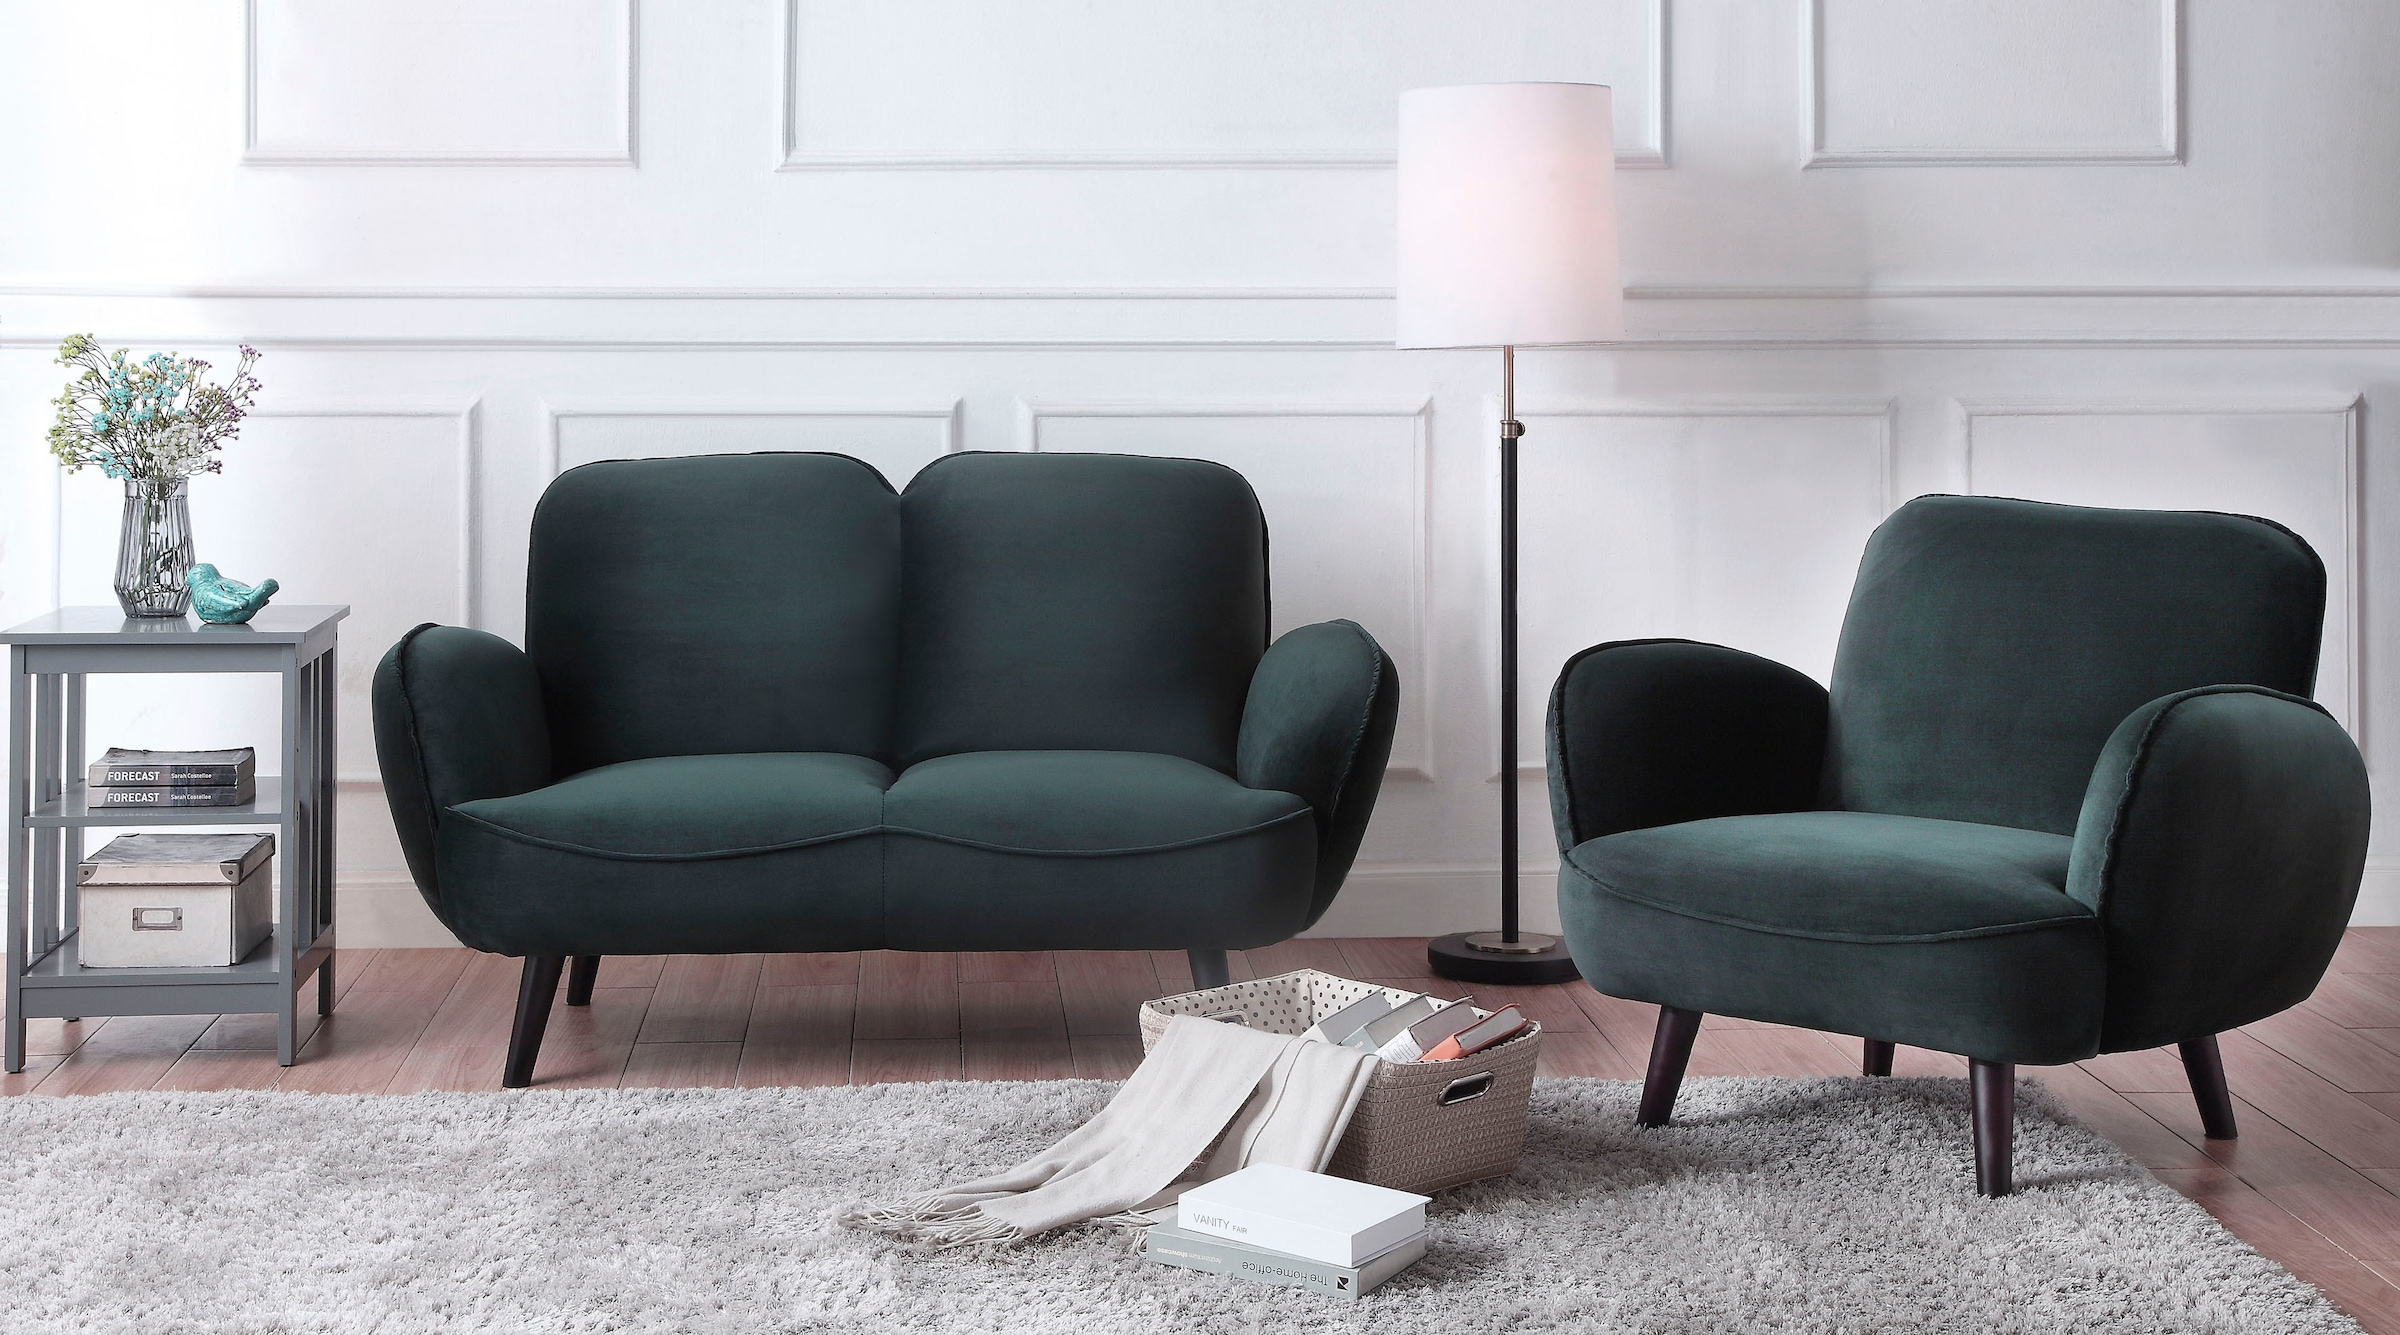 Image of ATLANTIC home collection 2-Sitzer, mit Wellenunterfederung